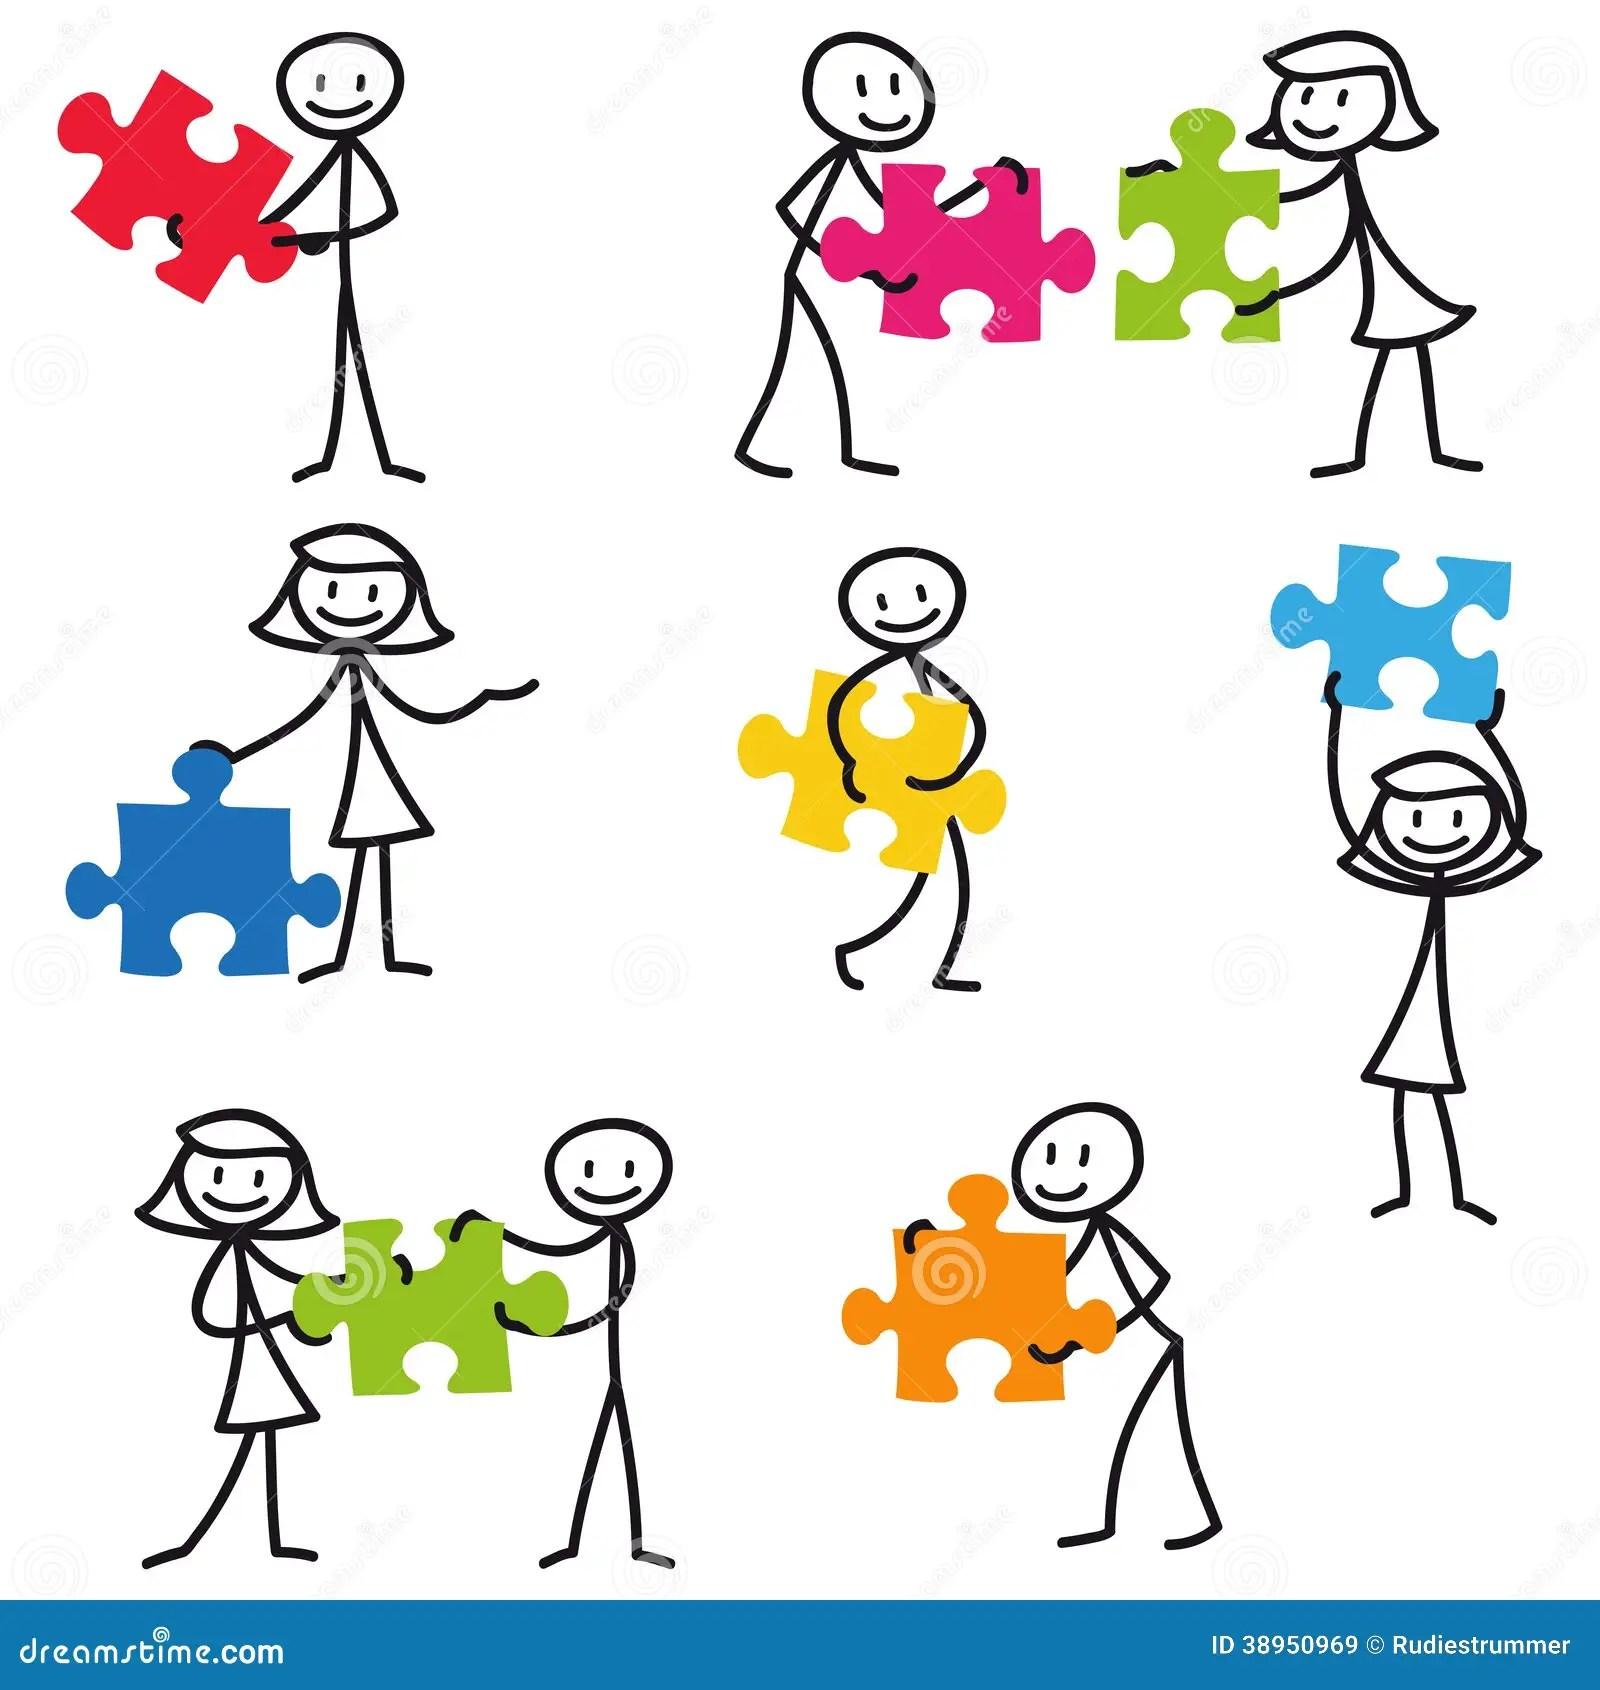 Stick Man Stick Figure Jigsaw Puzzle Stock Illustrations 71 Stick Man Stick Figure Jigsaw